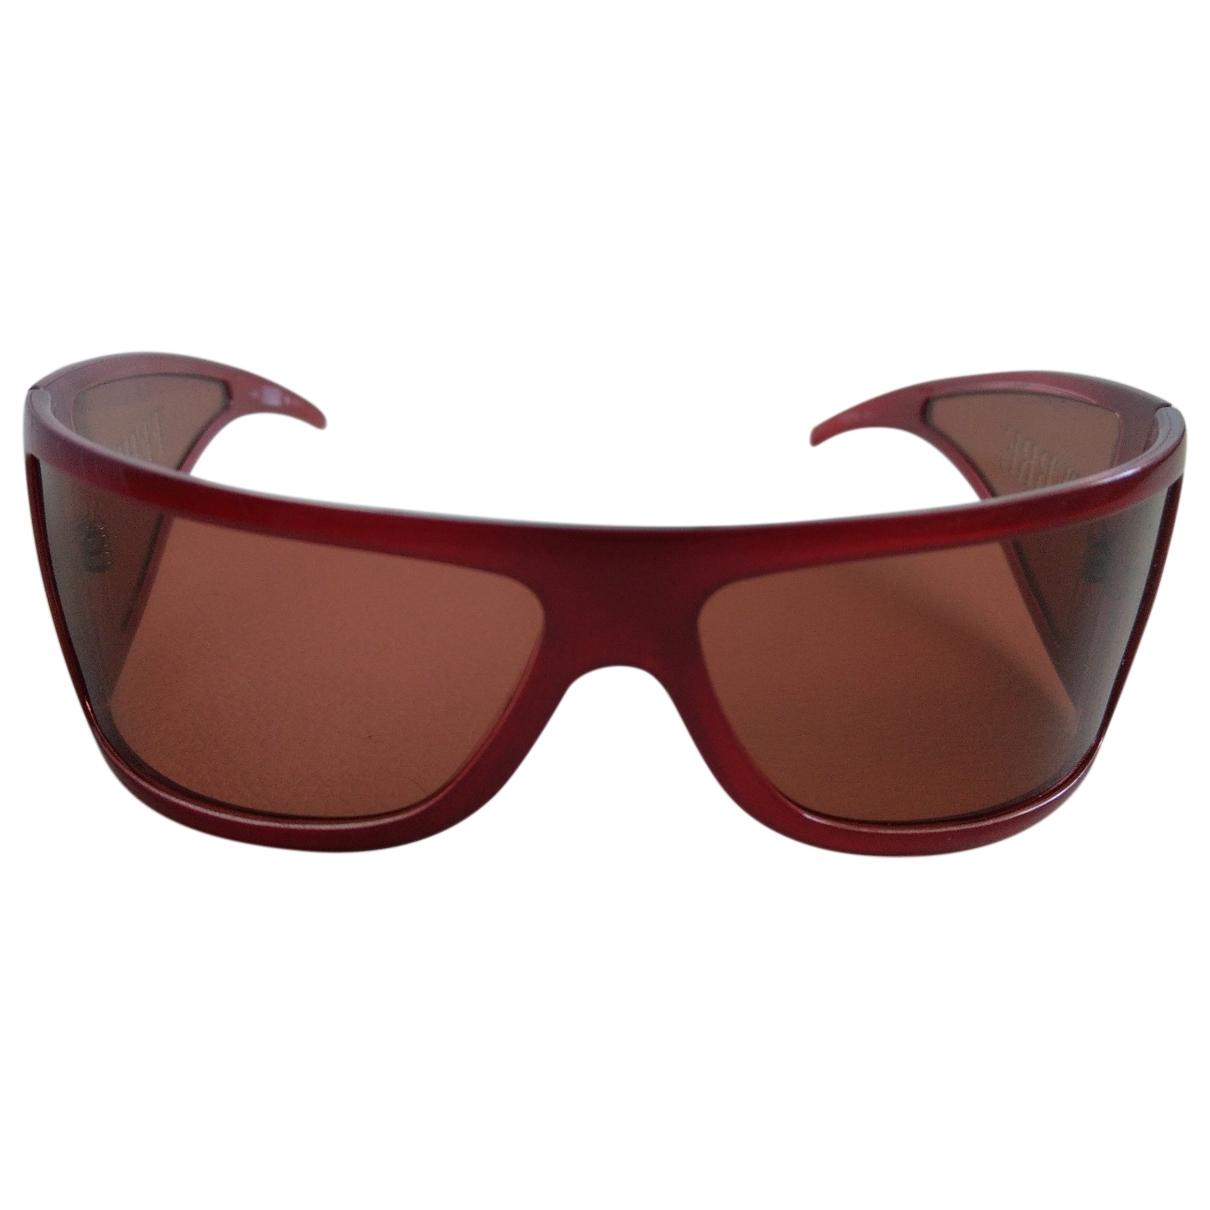 Gianfranco Ferré \N Burgundy Sunglasses for Women \N